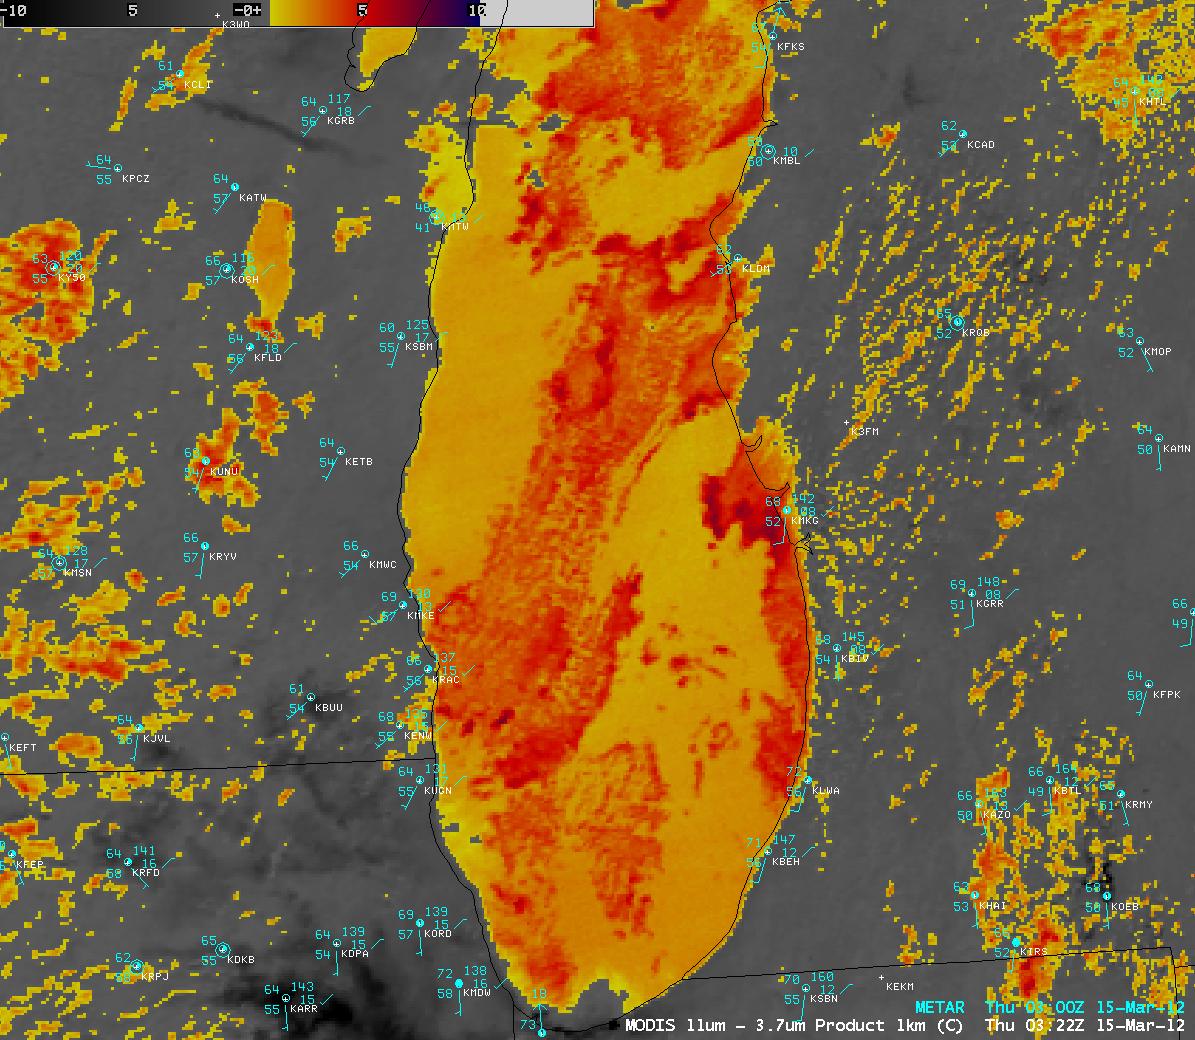 MODIS fog/stratus product